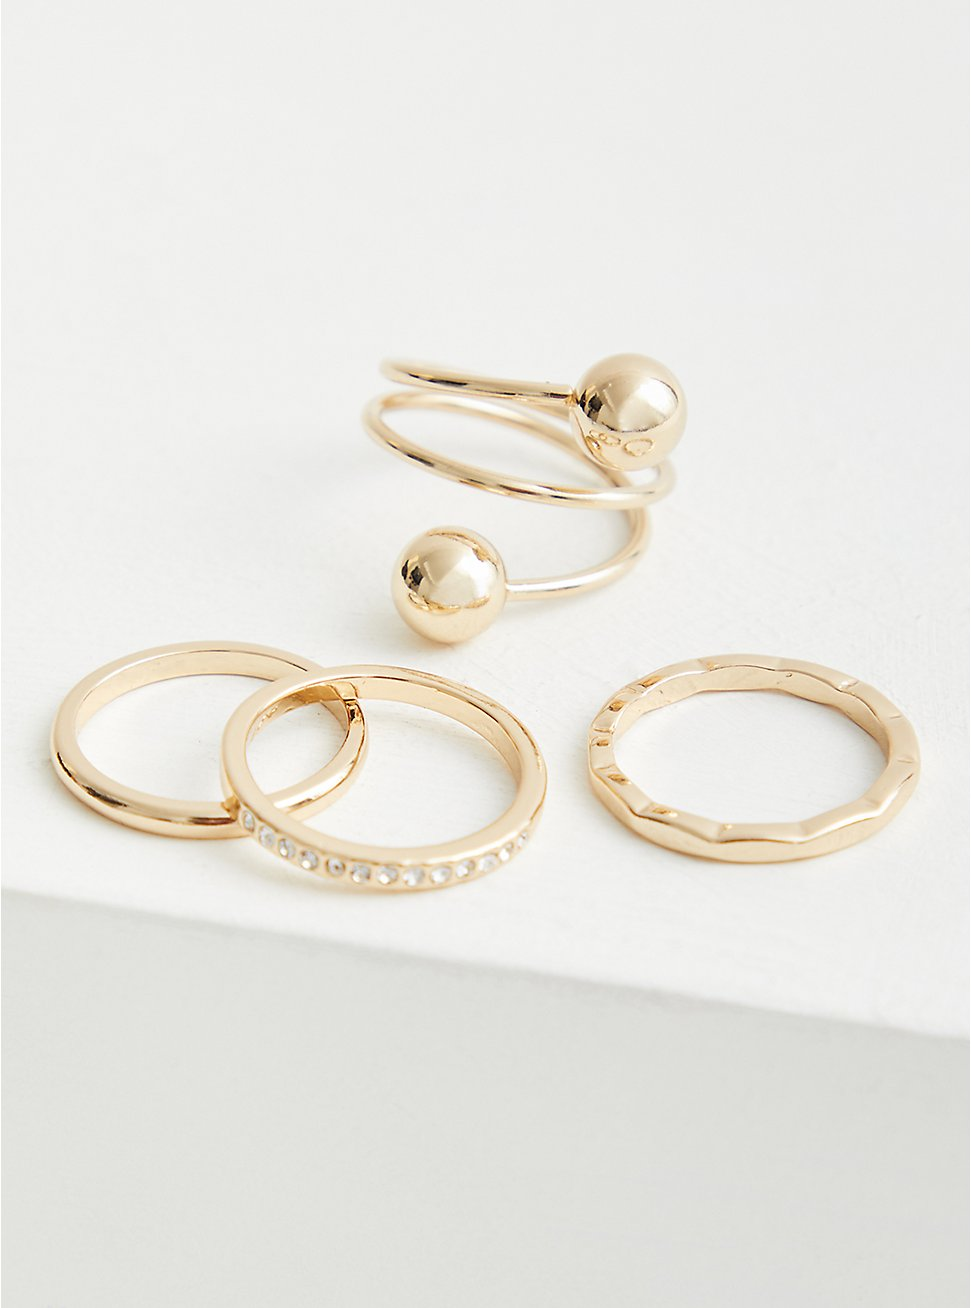 Spiral Ball Ring Set of 4 - Gold Tone, , hi-res